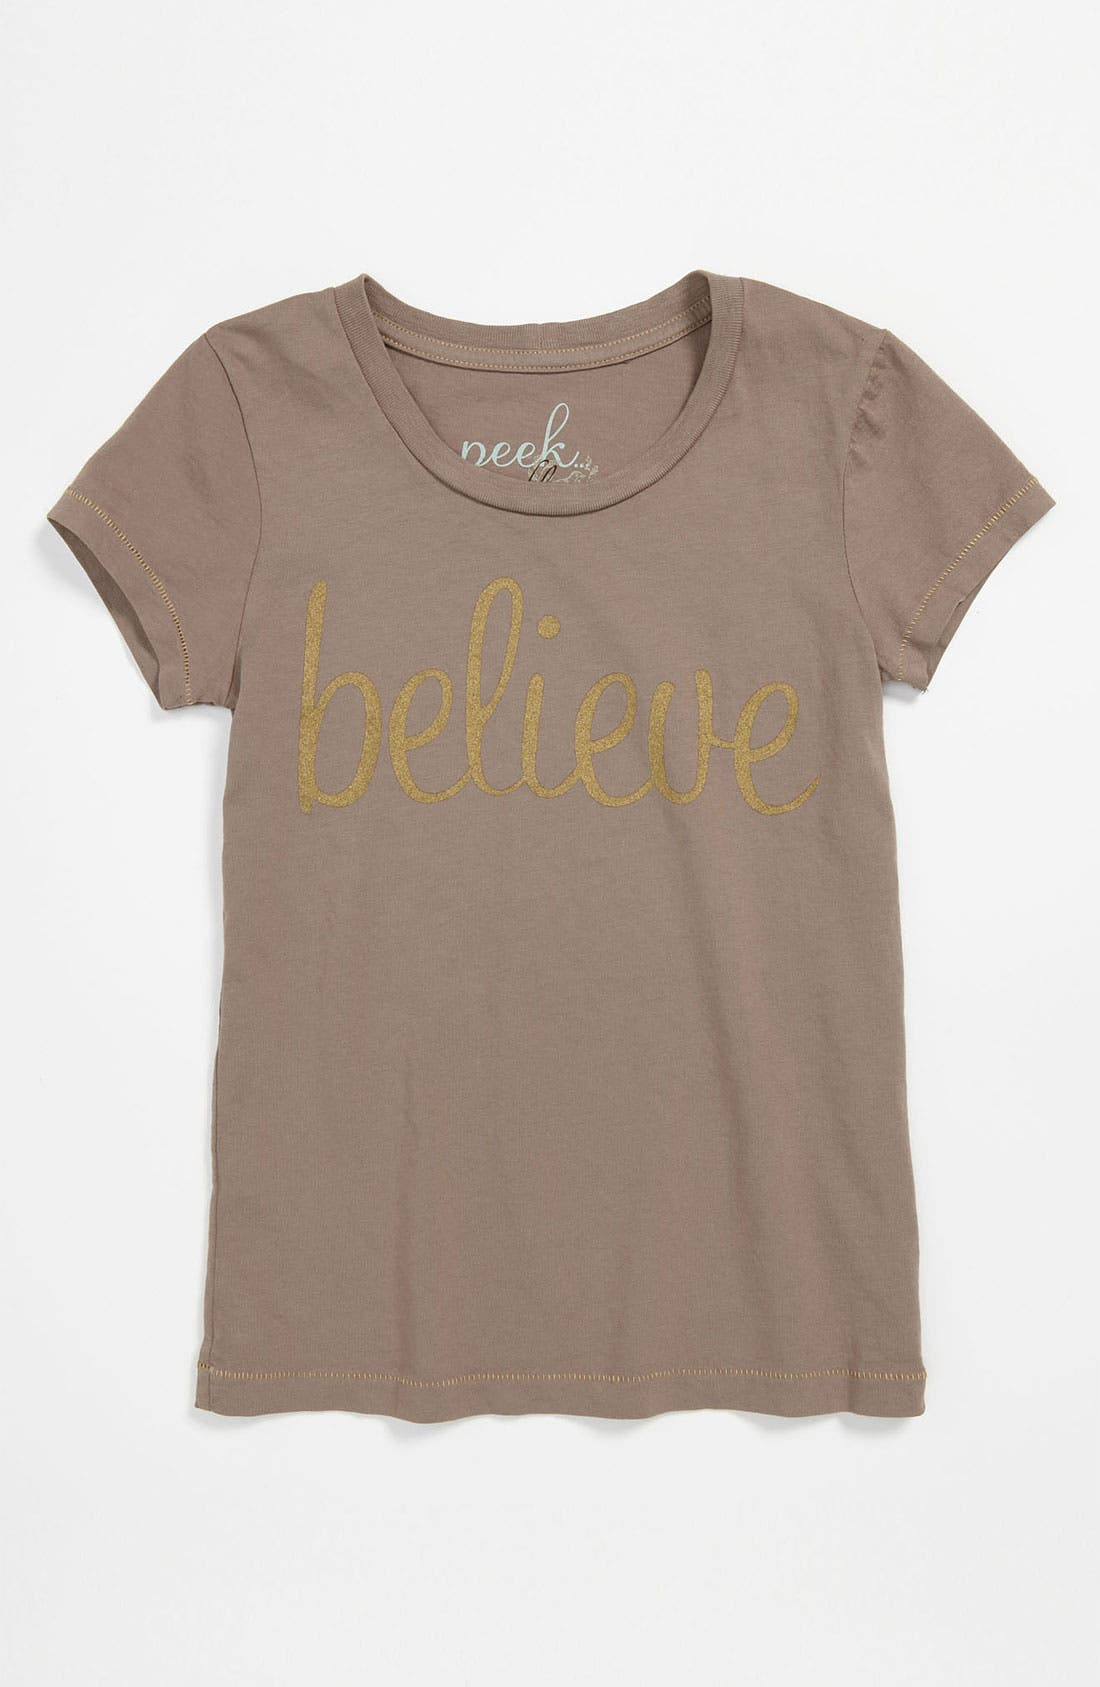 Main Image - Peek 'Believe' Tee (Toddler, Little Girls & Big Girls)